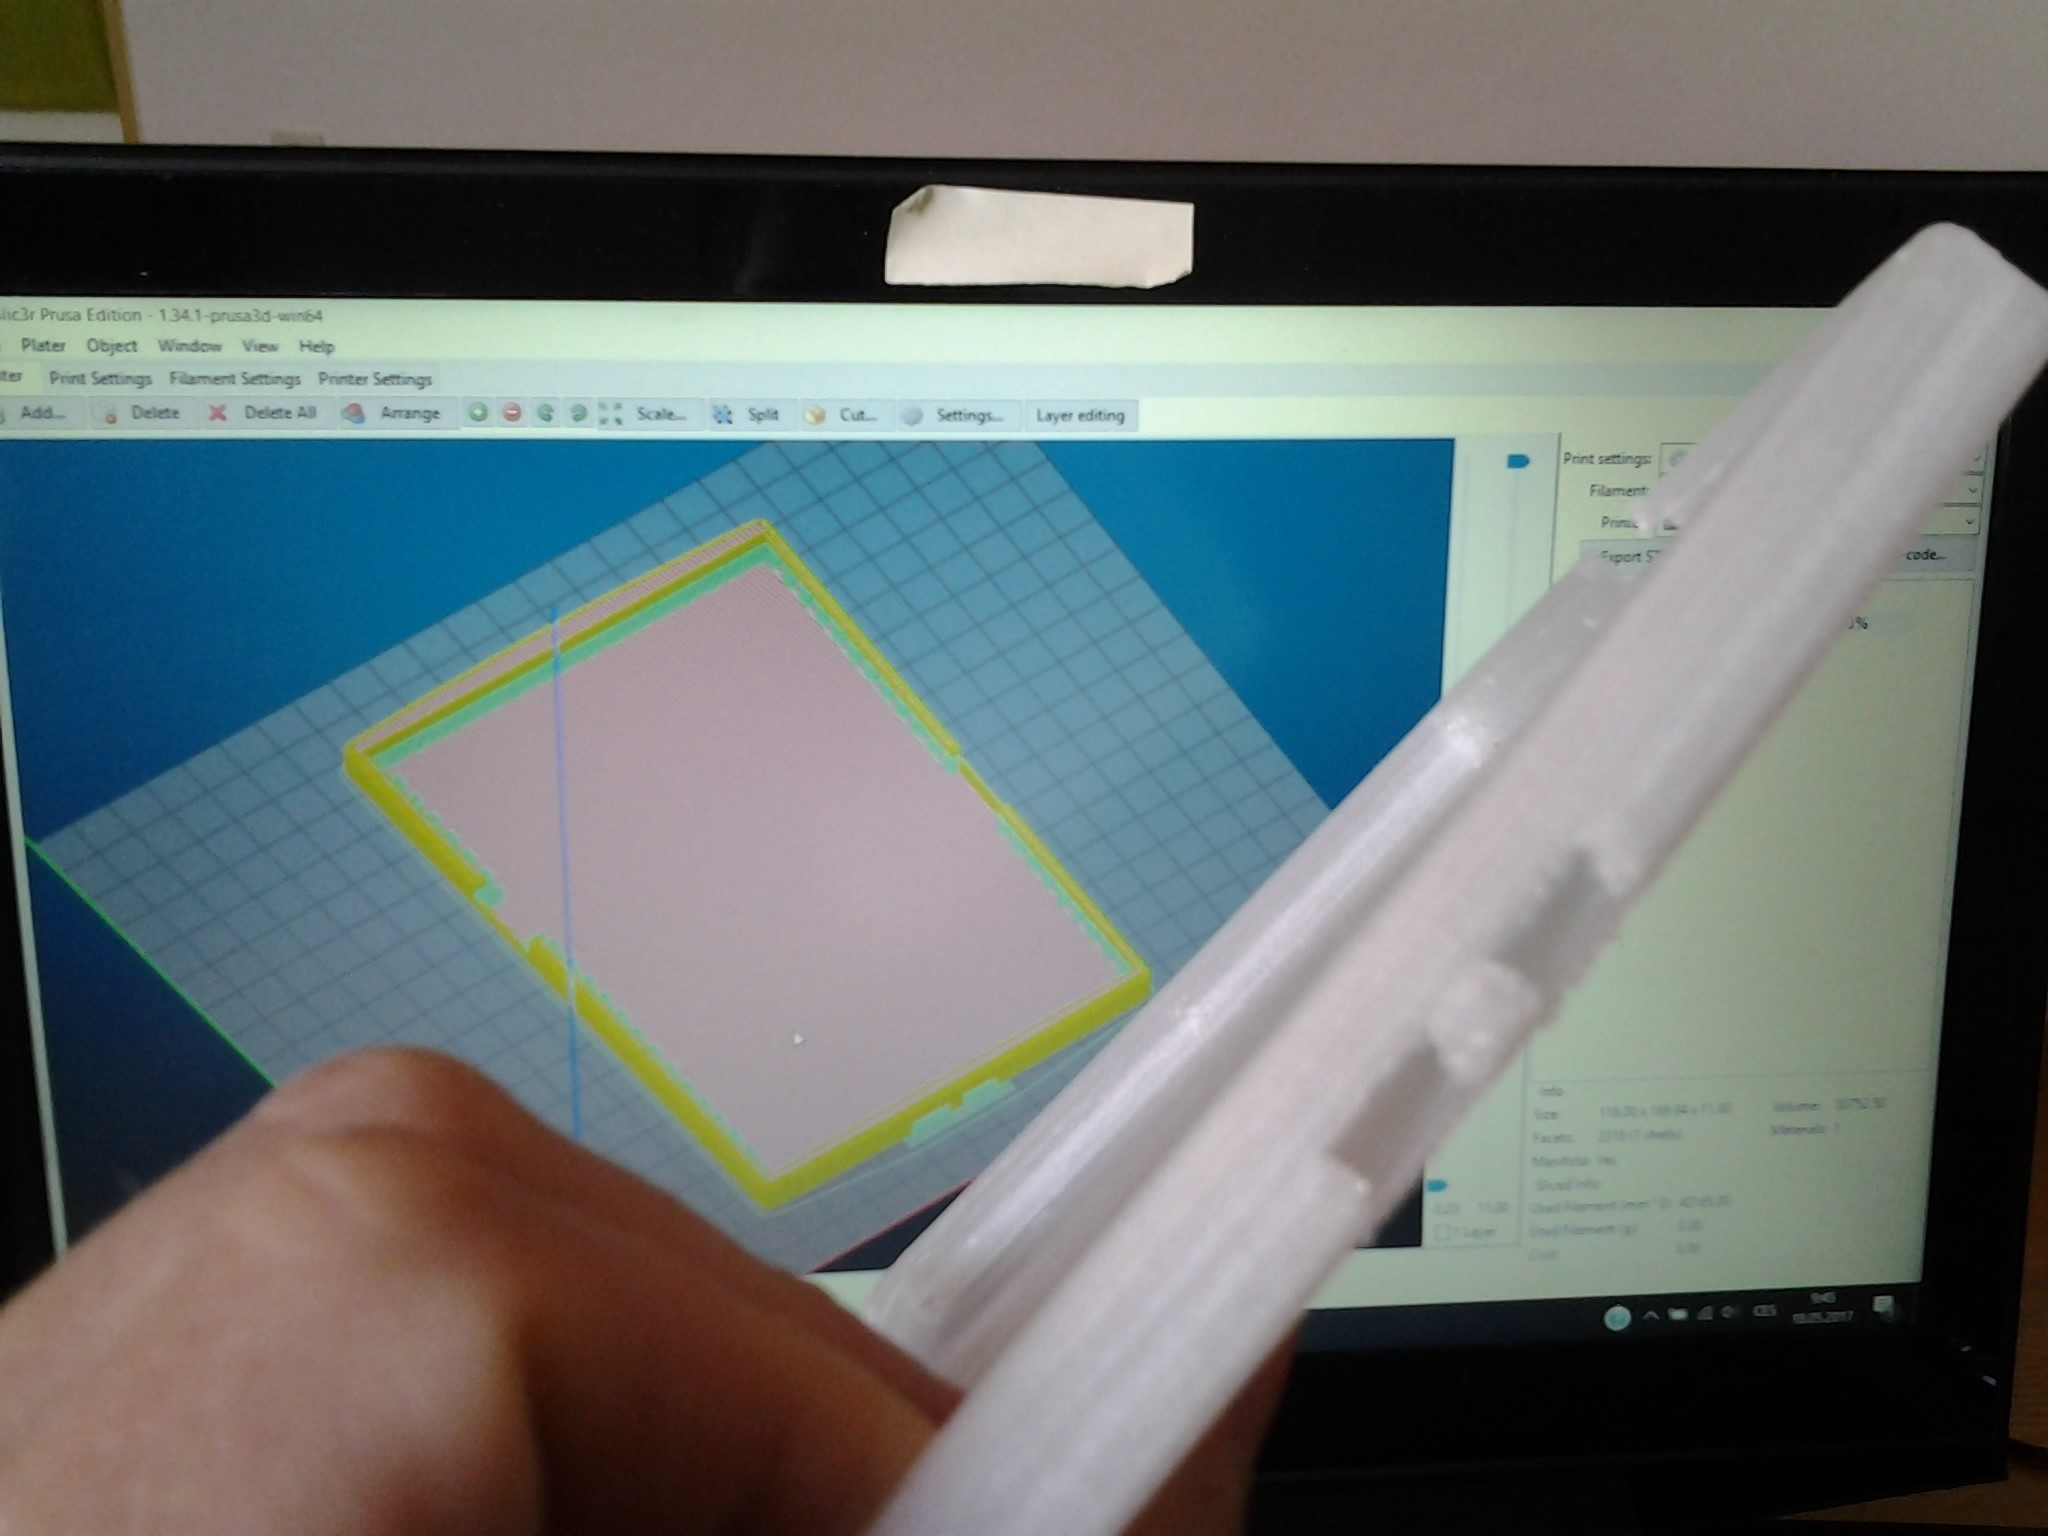 2017-05-18 09.47.29.jpg Download STL file kindle casing • 3D printing template, Amador